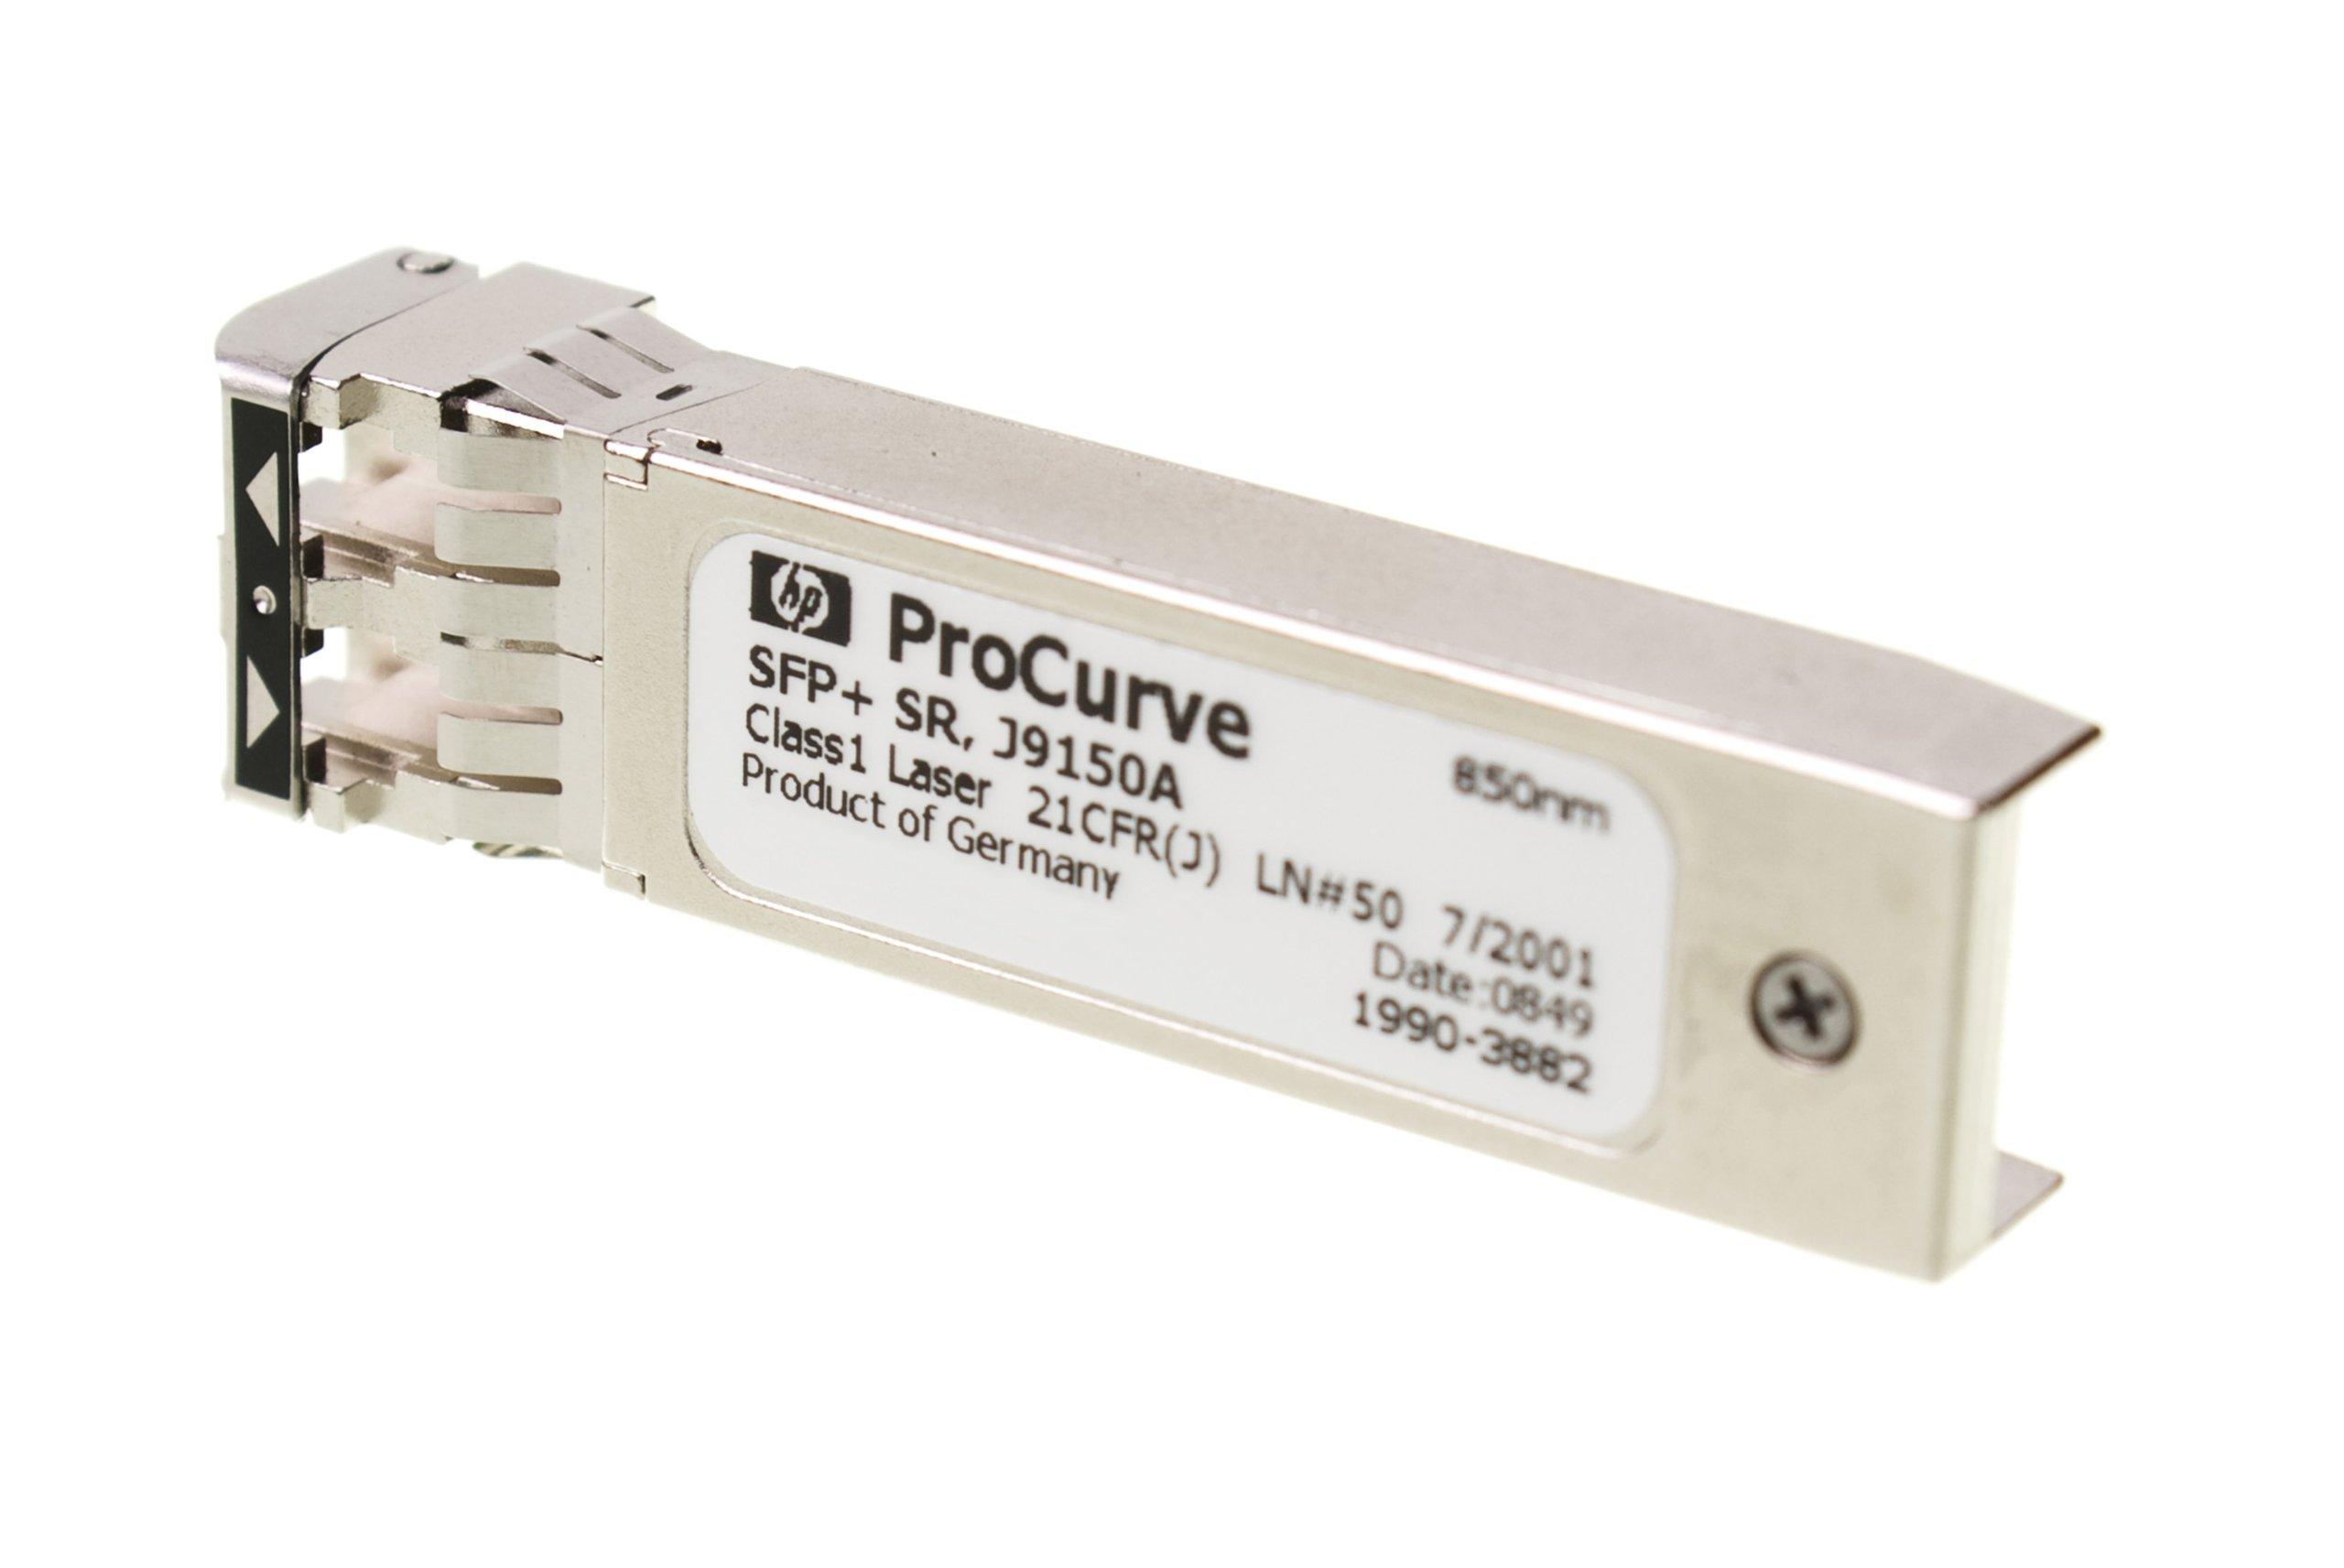 Hewlett Packard HP ProCurve 10-Gbe SFP+ SR Transceiver - Limited by HP